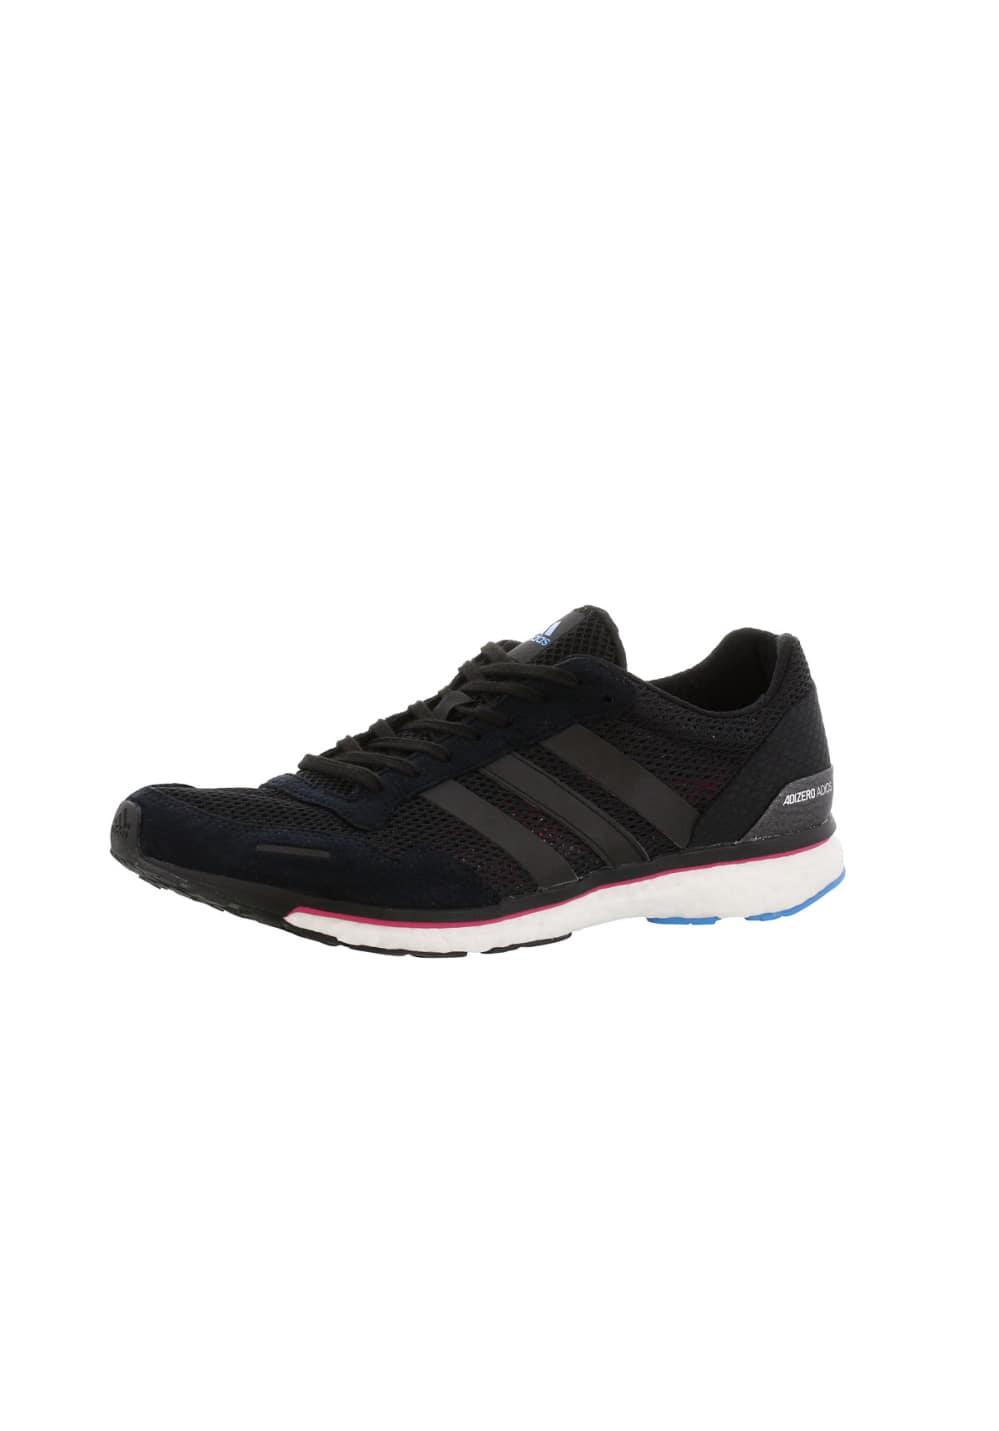 new product 8aa4d 1e0af ... adidas Adizero Adios 3 - Zapatillas de running para Mujer - Negro.  Volver. 1 2 3 4 5. Previous